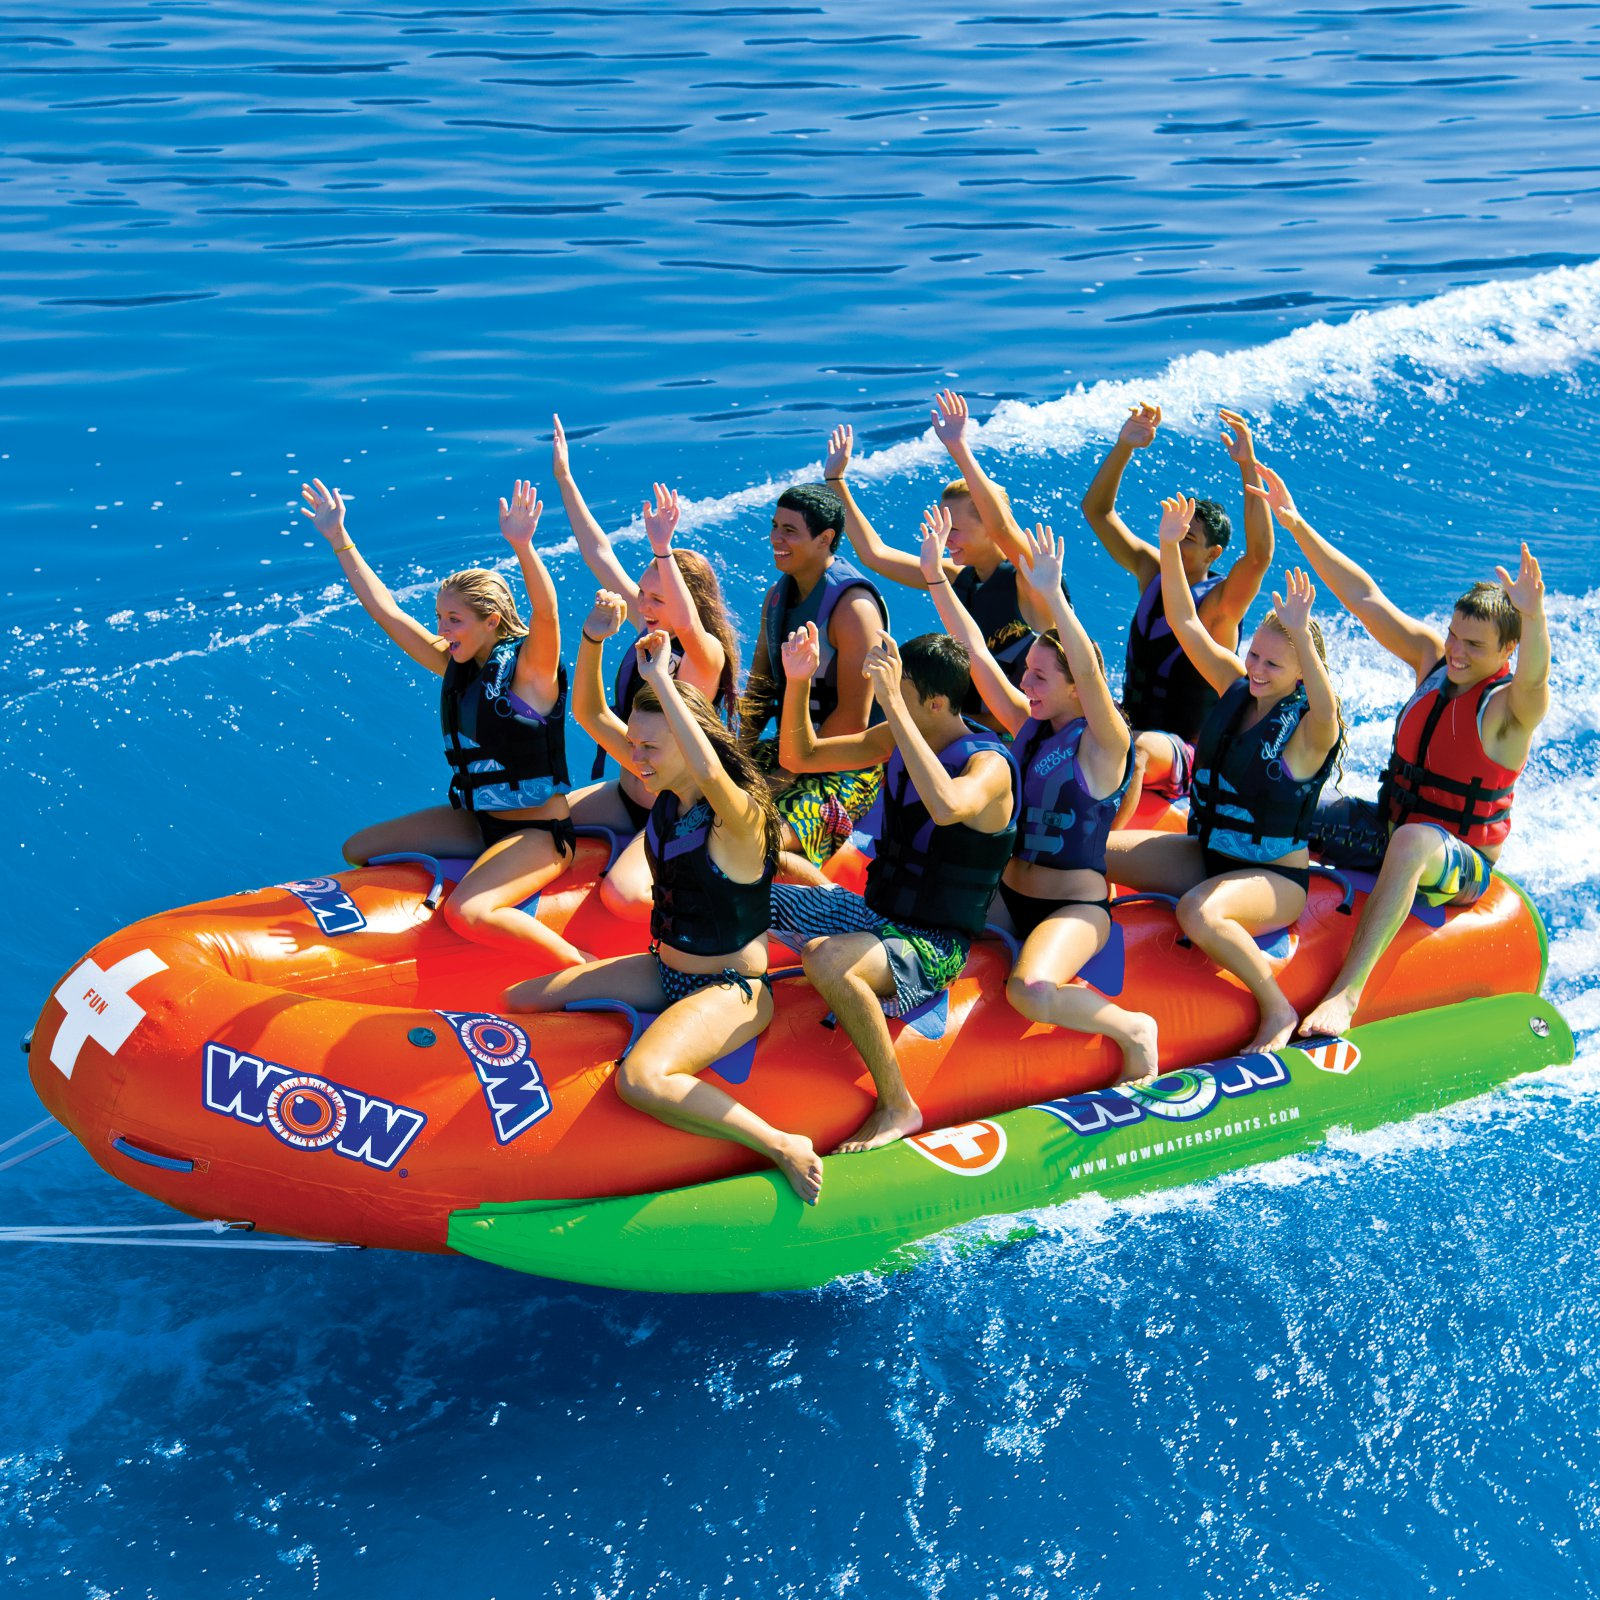 10-Person Closed Bow Banana Boat